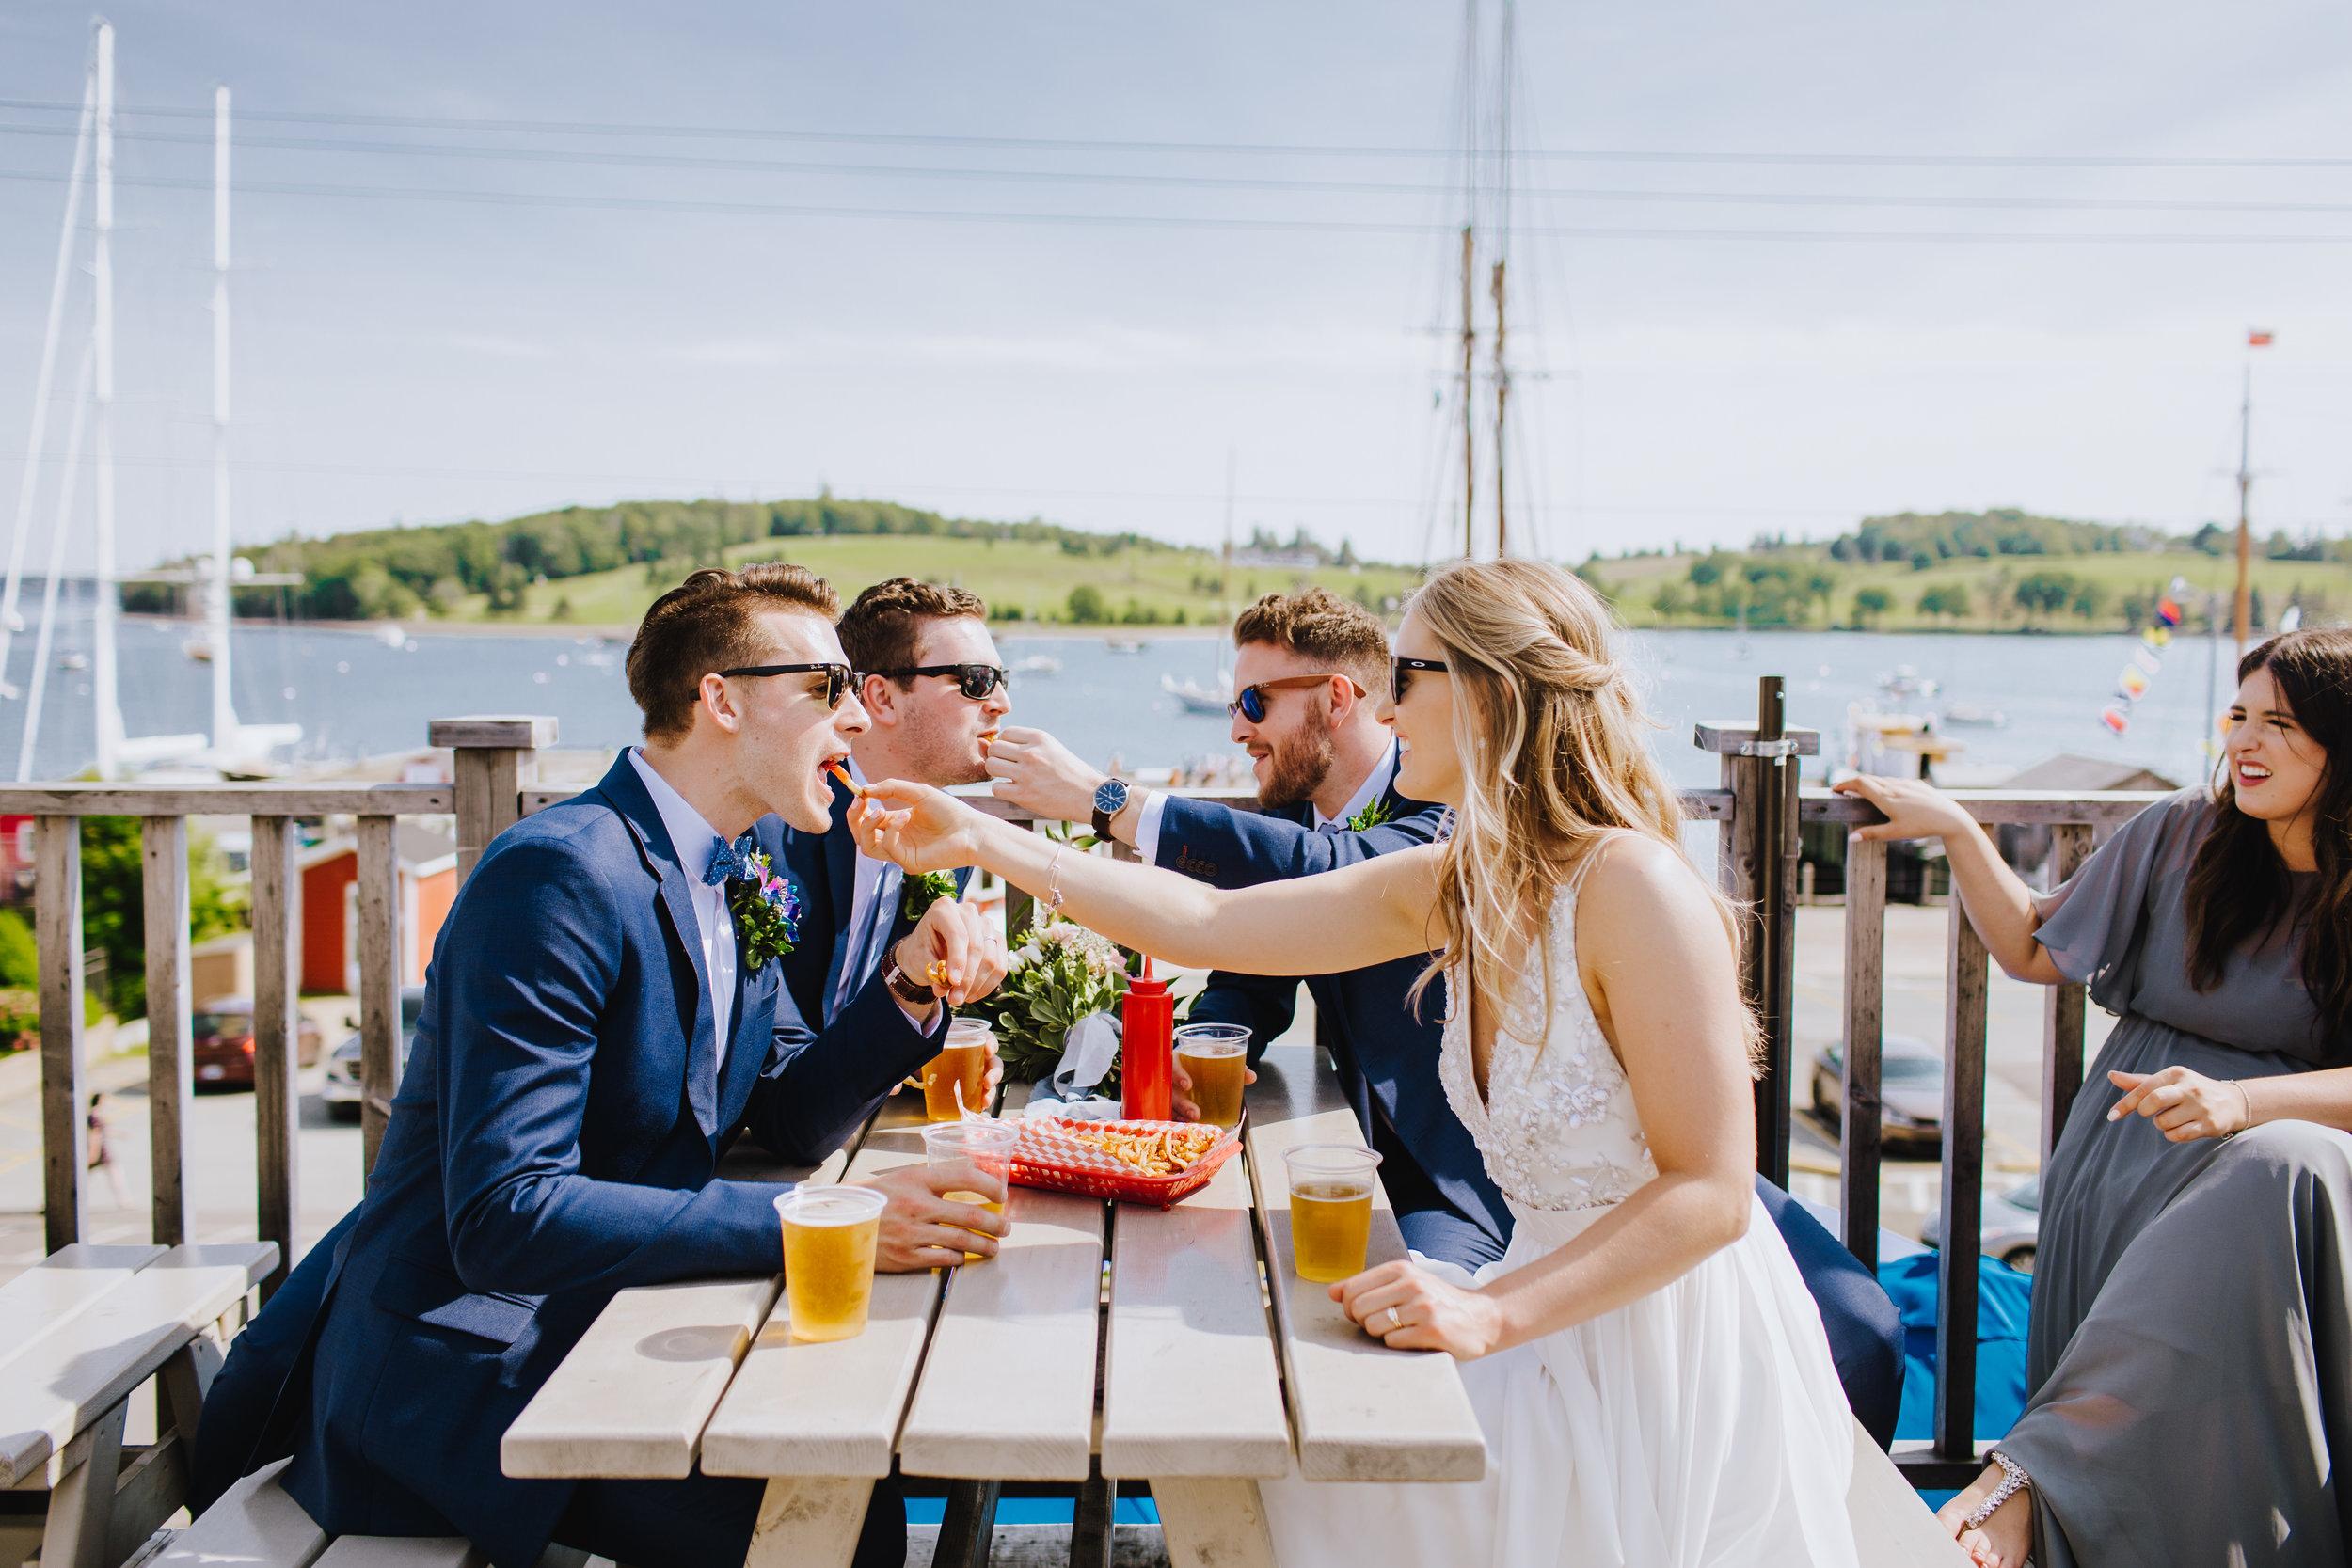 BOSCAWEN-INN-LUNENBURG-WEDDING-DAVE-AND-PRING-PHOTOGRAPHY-SOUTH-SHORE-LUNENBURG-BLUE-NOSE-BRIDE-GROOM-FISH-SHACK